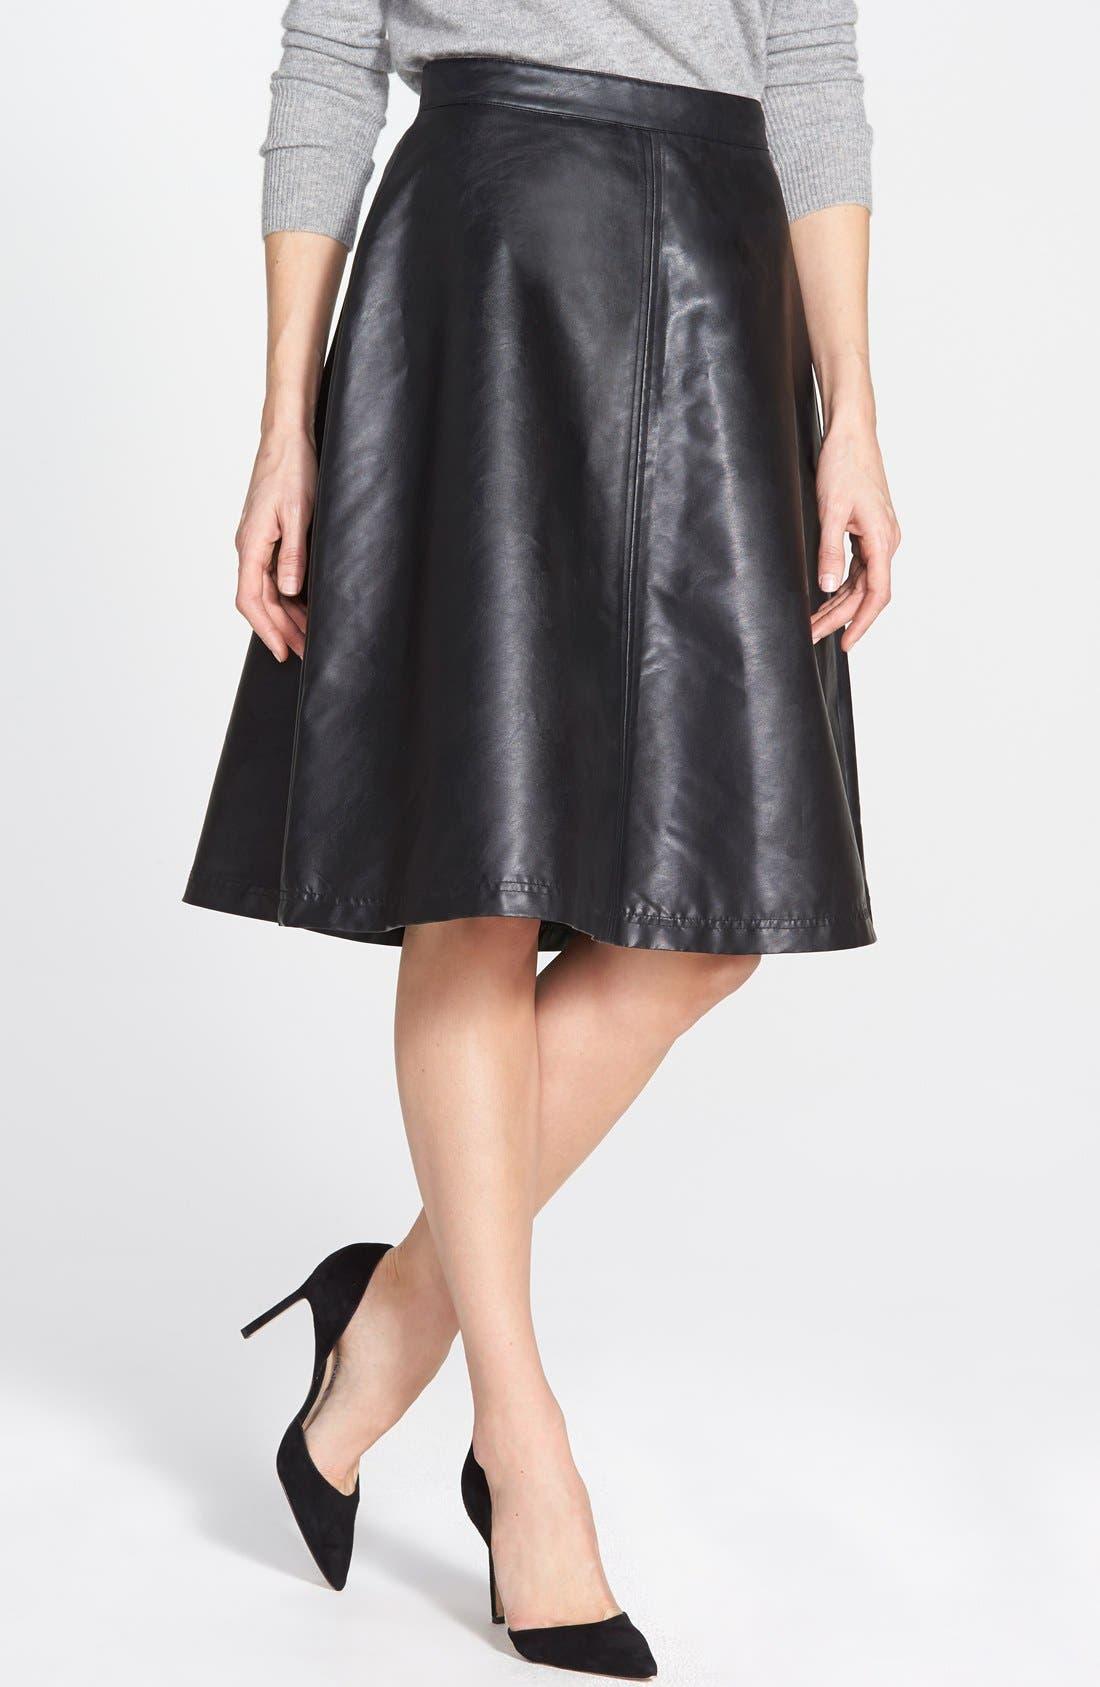 Alternate Image 1 Selected - Halogen® Faux Leather A-Line Skirt (Regular & Petite)